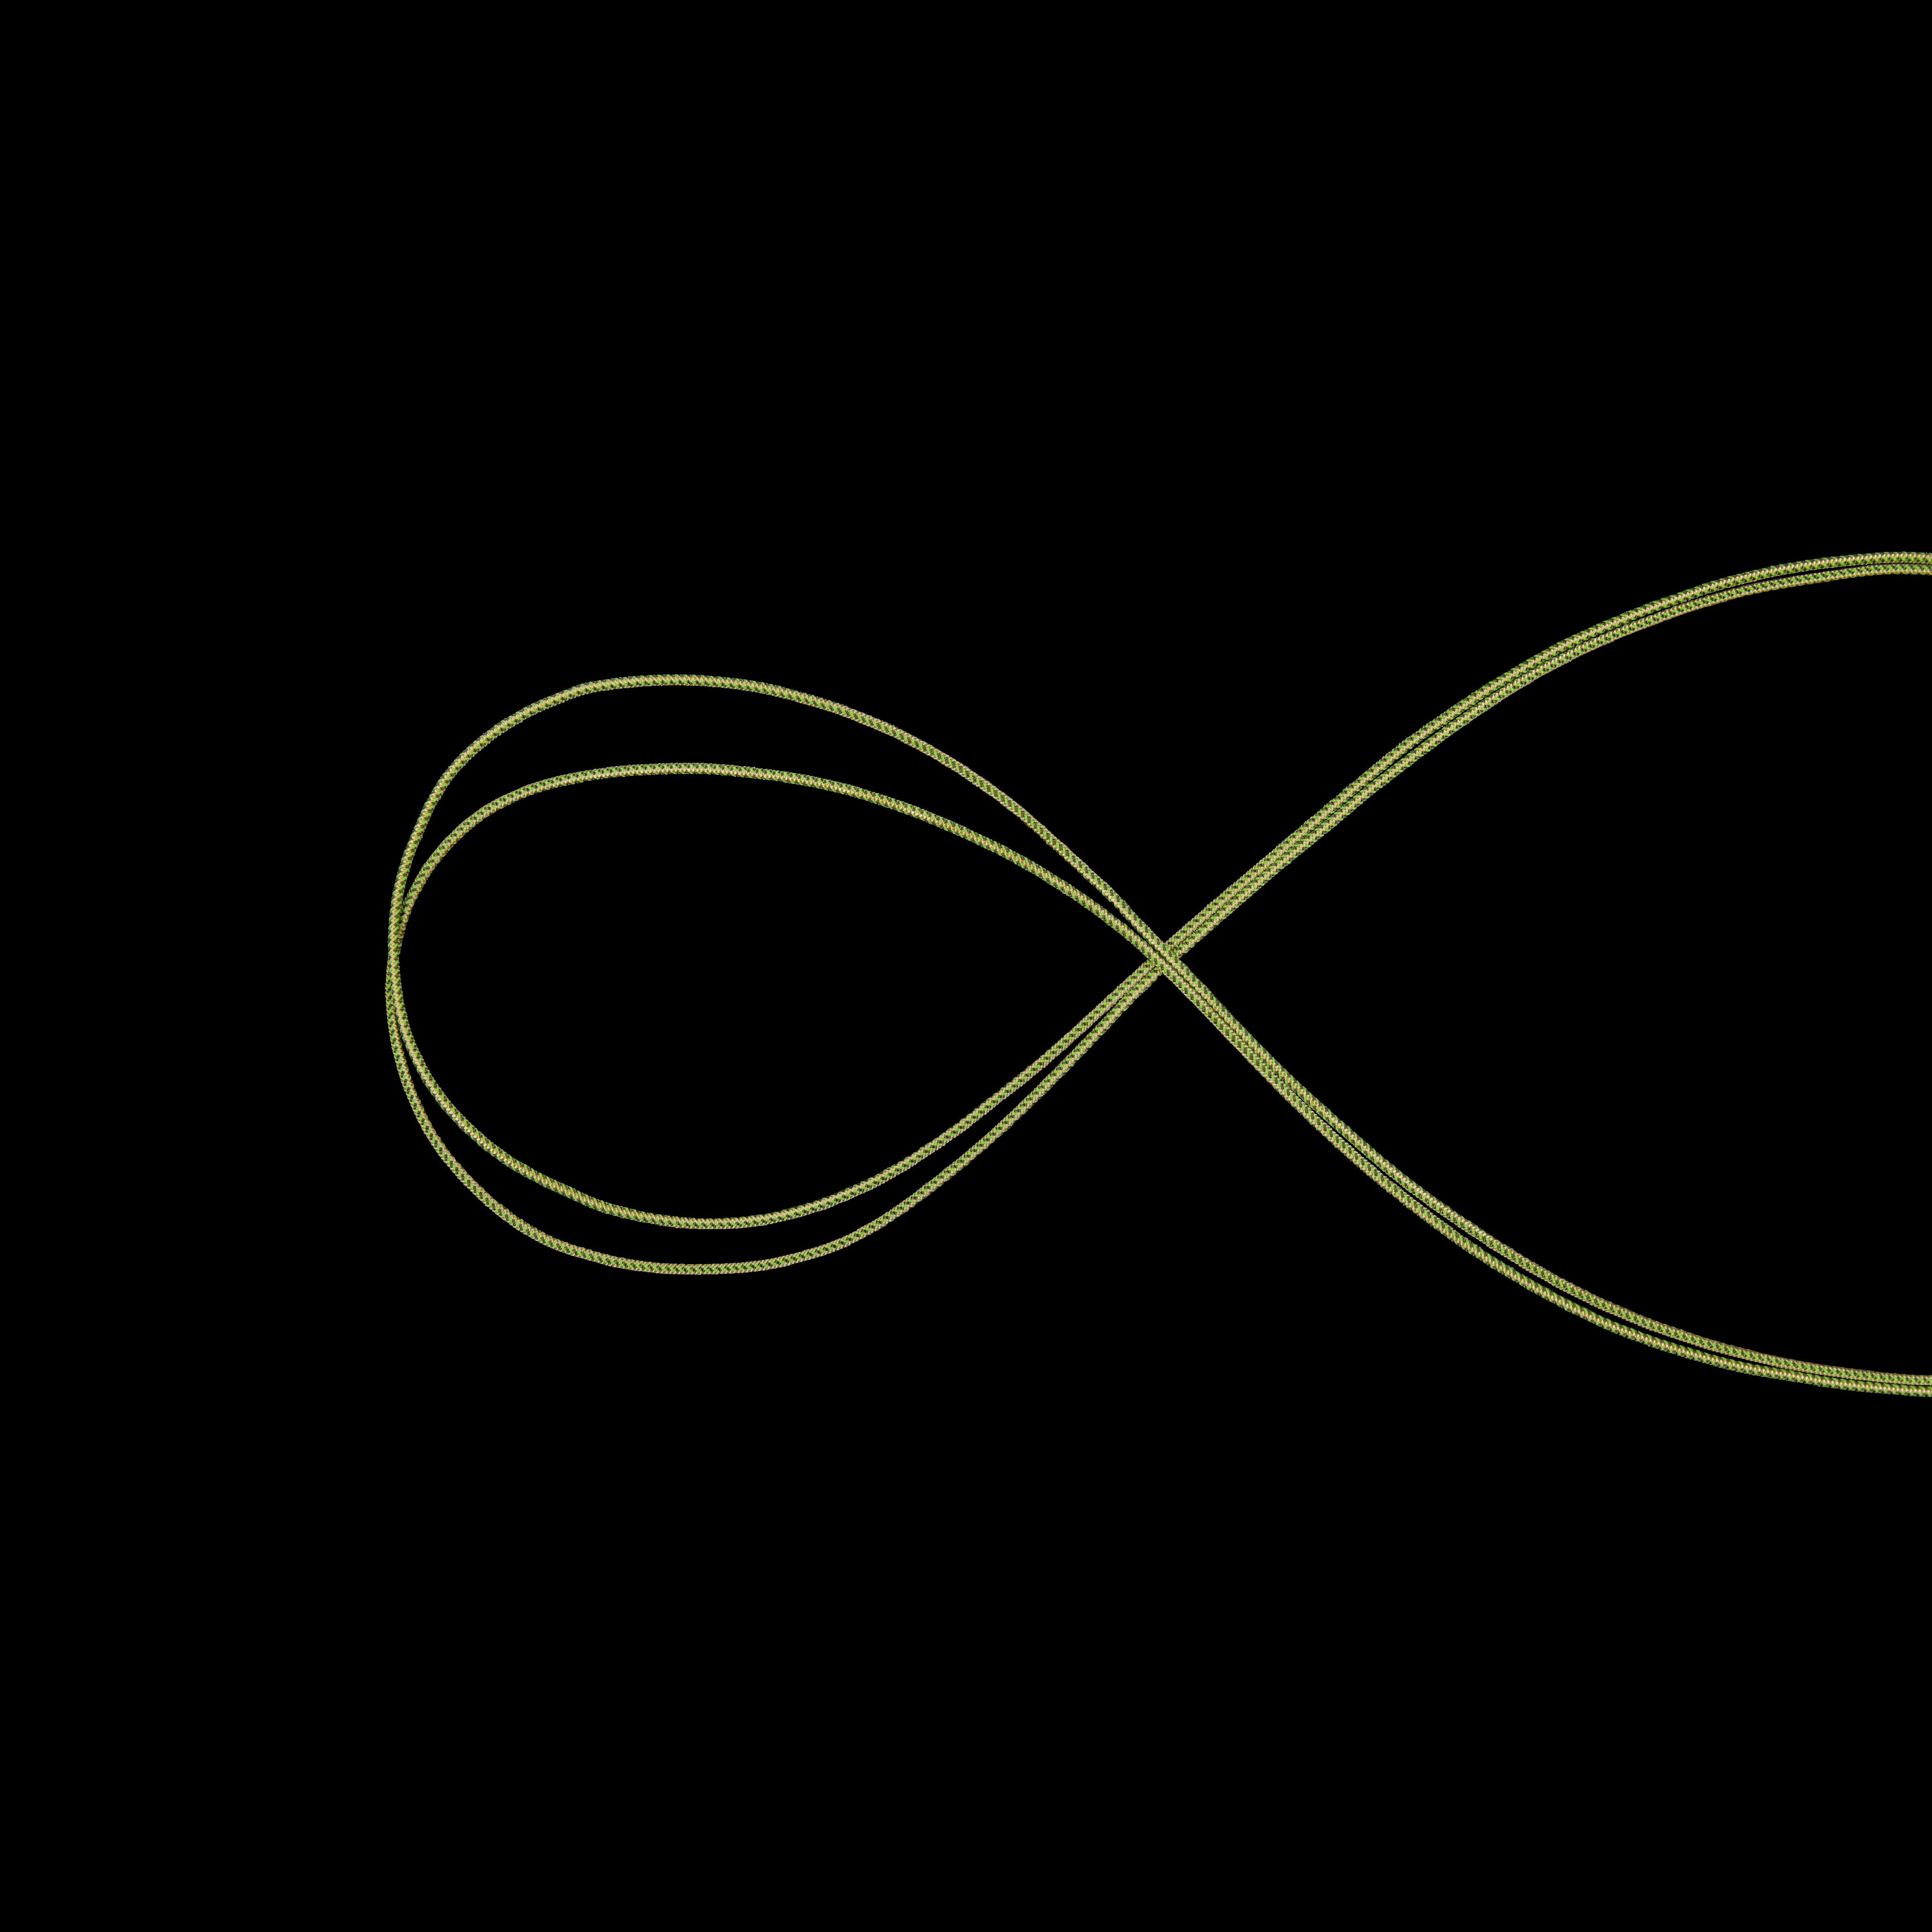 Cord POS - 4 mm, 7 m, green thumbnail